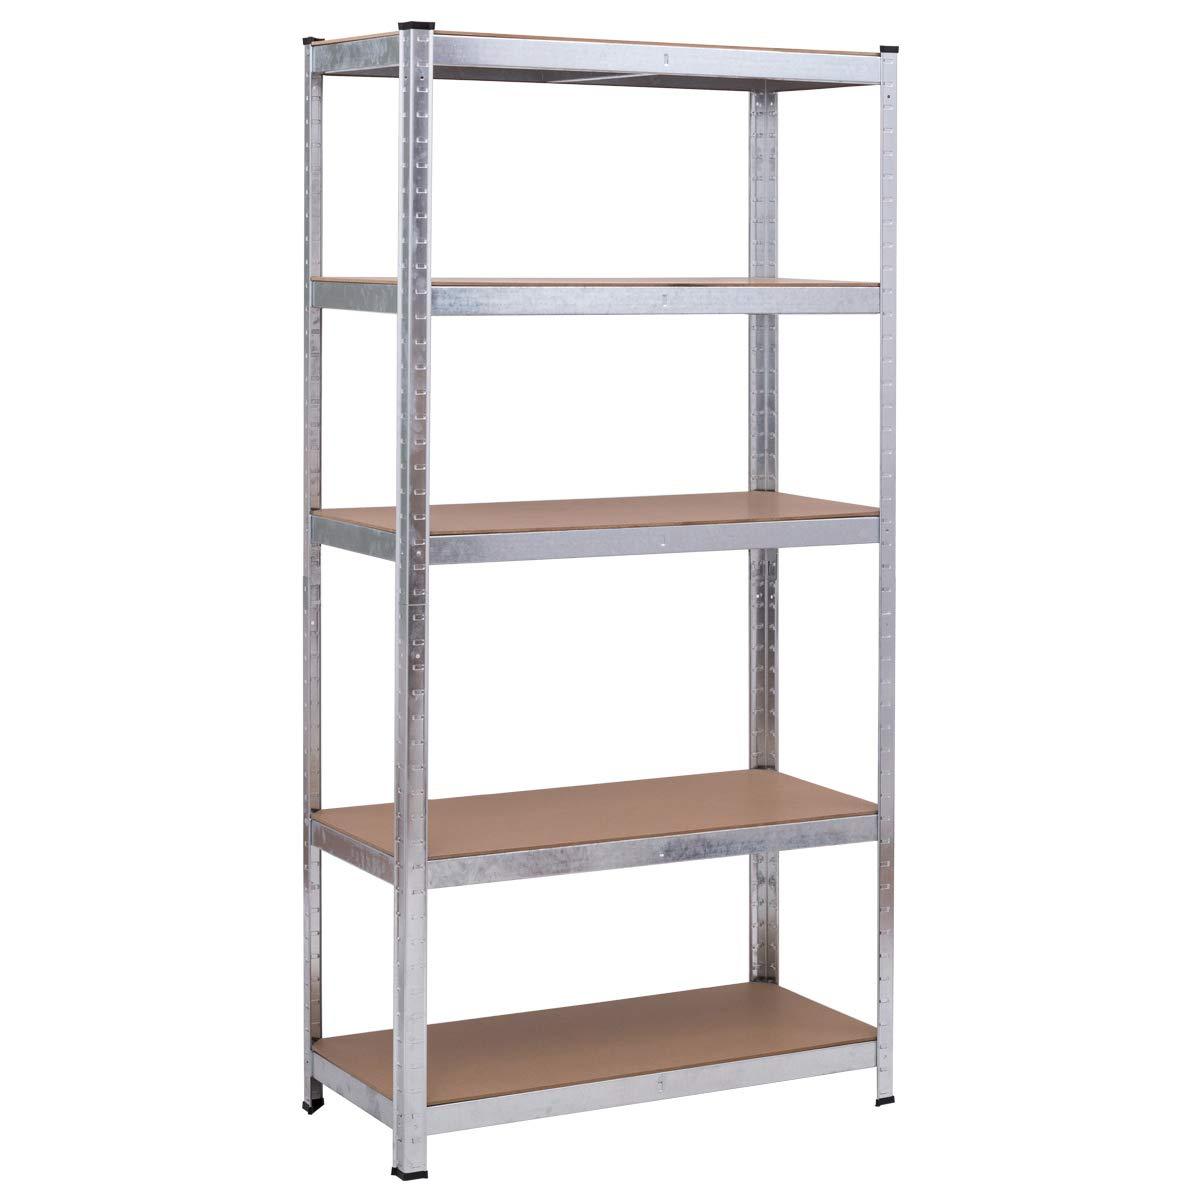 "Giantex Shelving Rack 5-Shelf Storage Shelf Steel Garage Utility Rack Adjustable Shelves Heavy Duty Multipurpose Display Stand for Books, Clothes, Kitchenware, Tools Bolt-Free Assembly 36''x 16''x 72"""